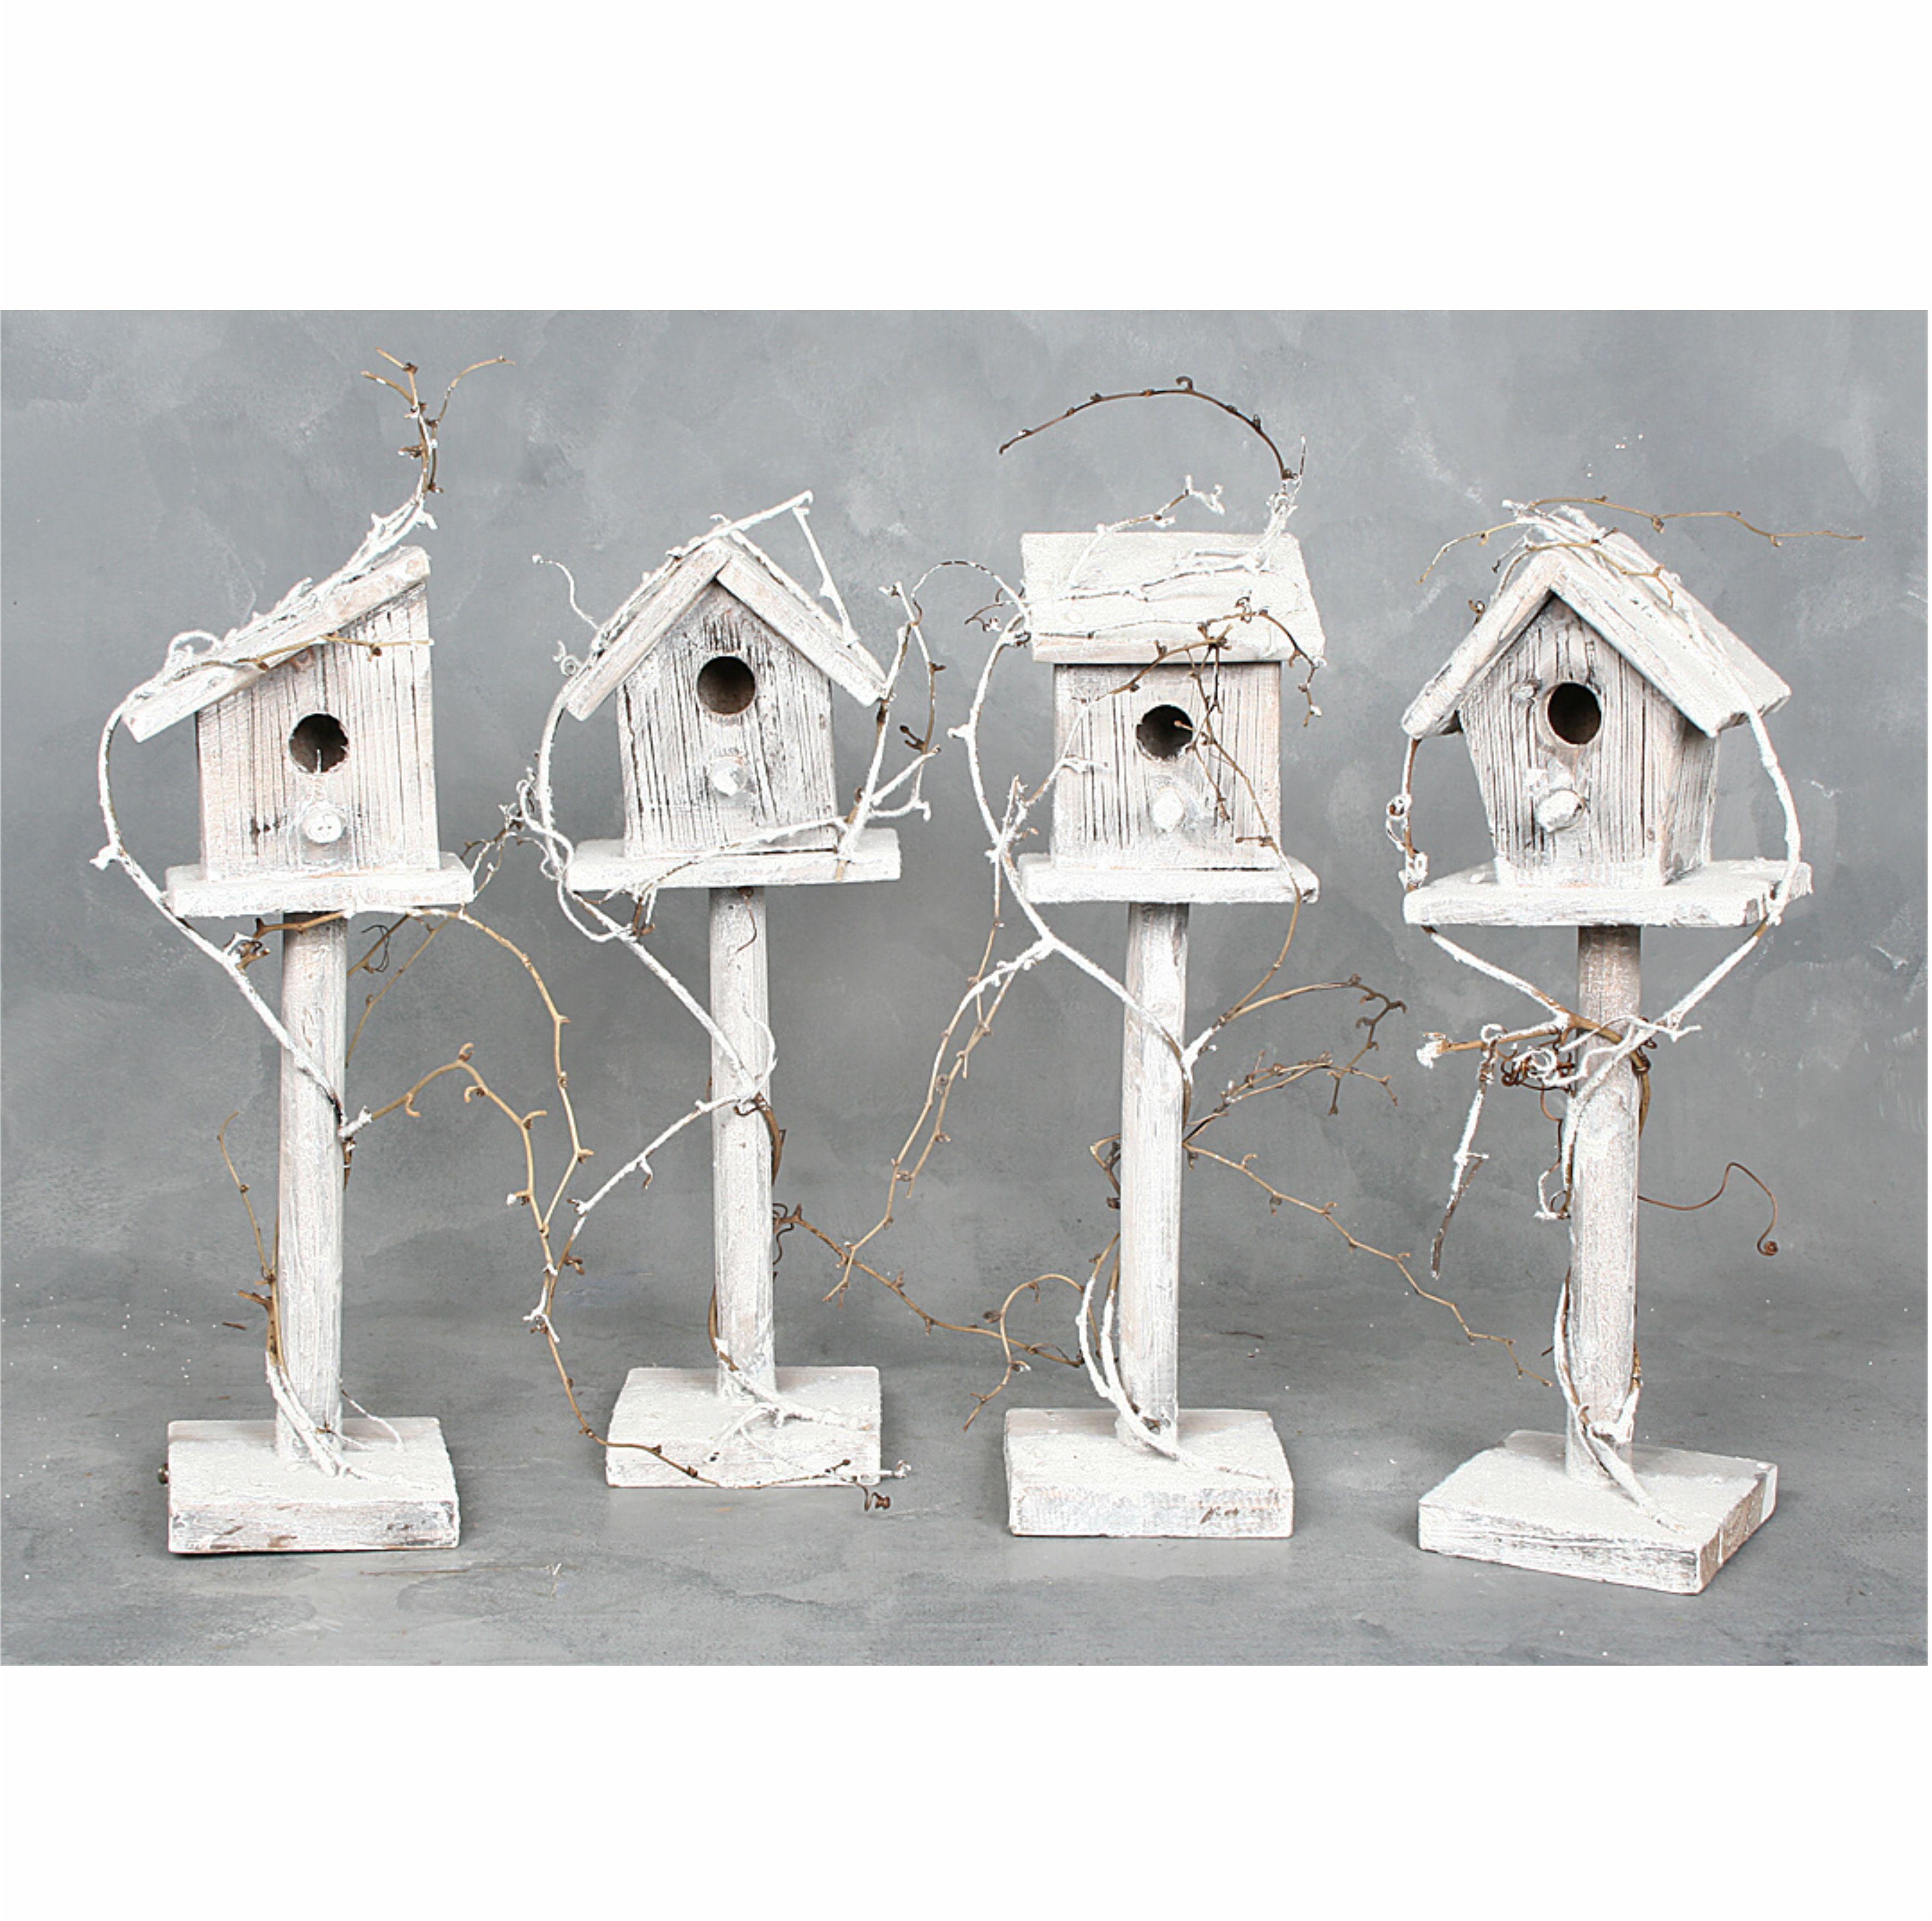 davide24 vogelhaus wei beschneit 4 st ck. Black Bedroom Furniture Sets. Home Design Ideas